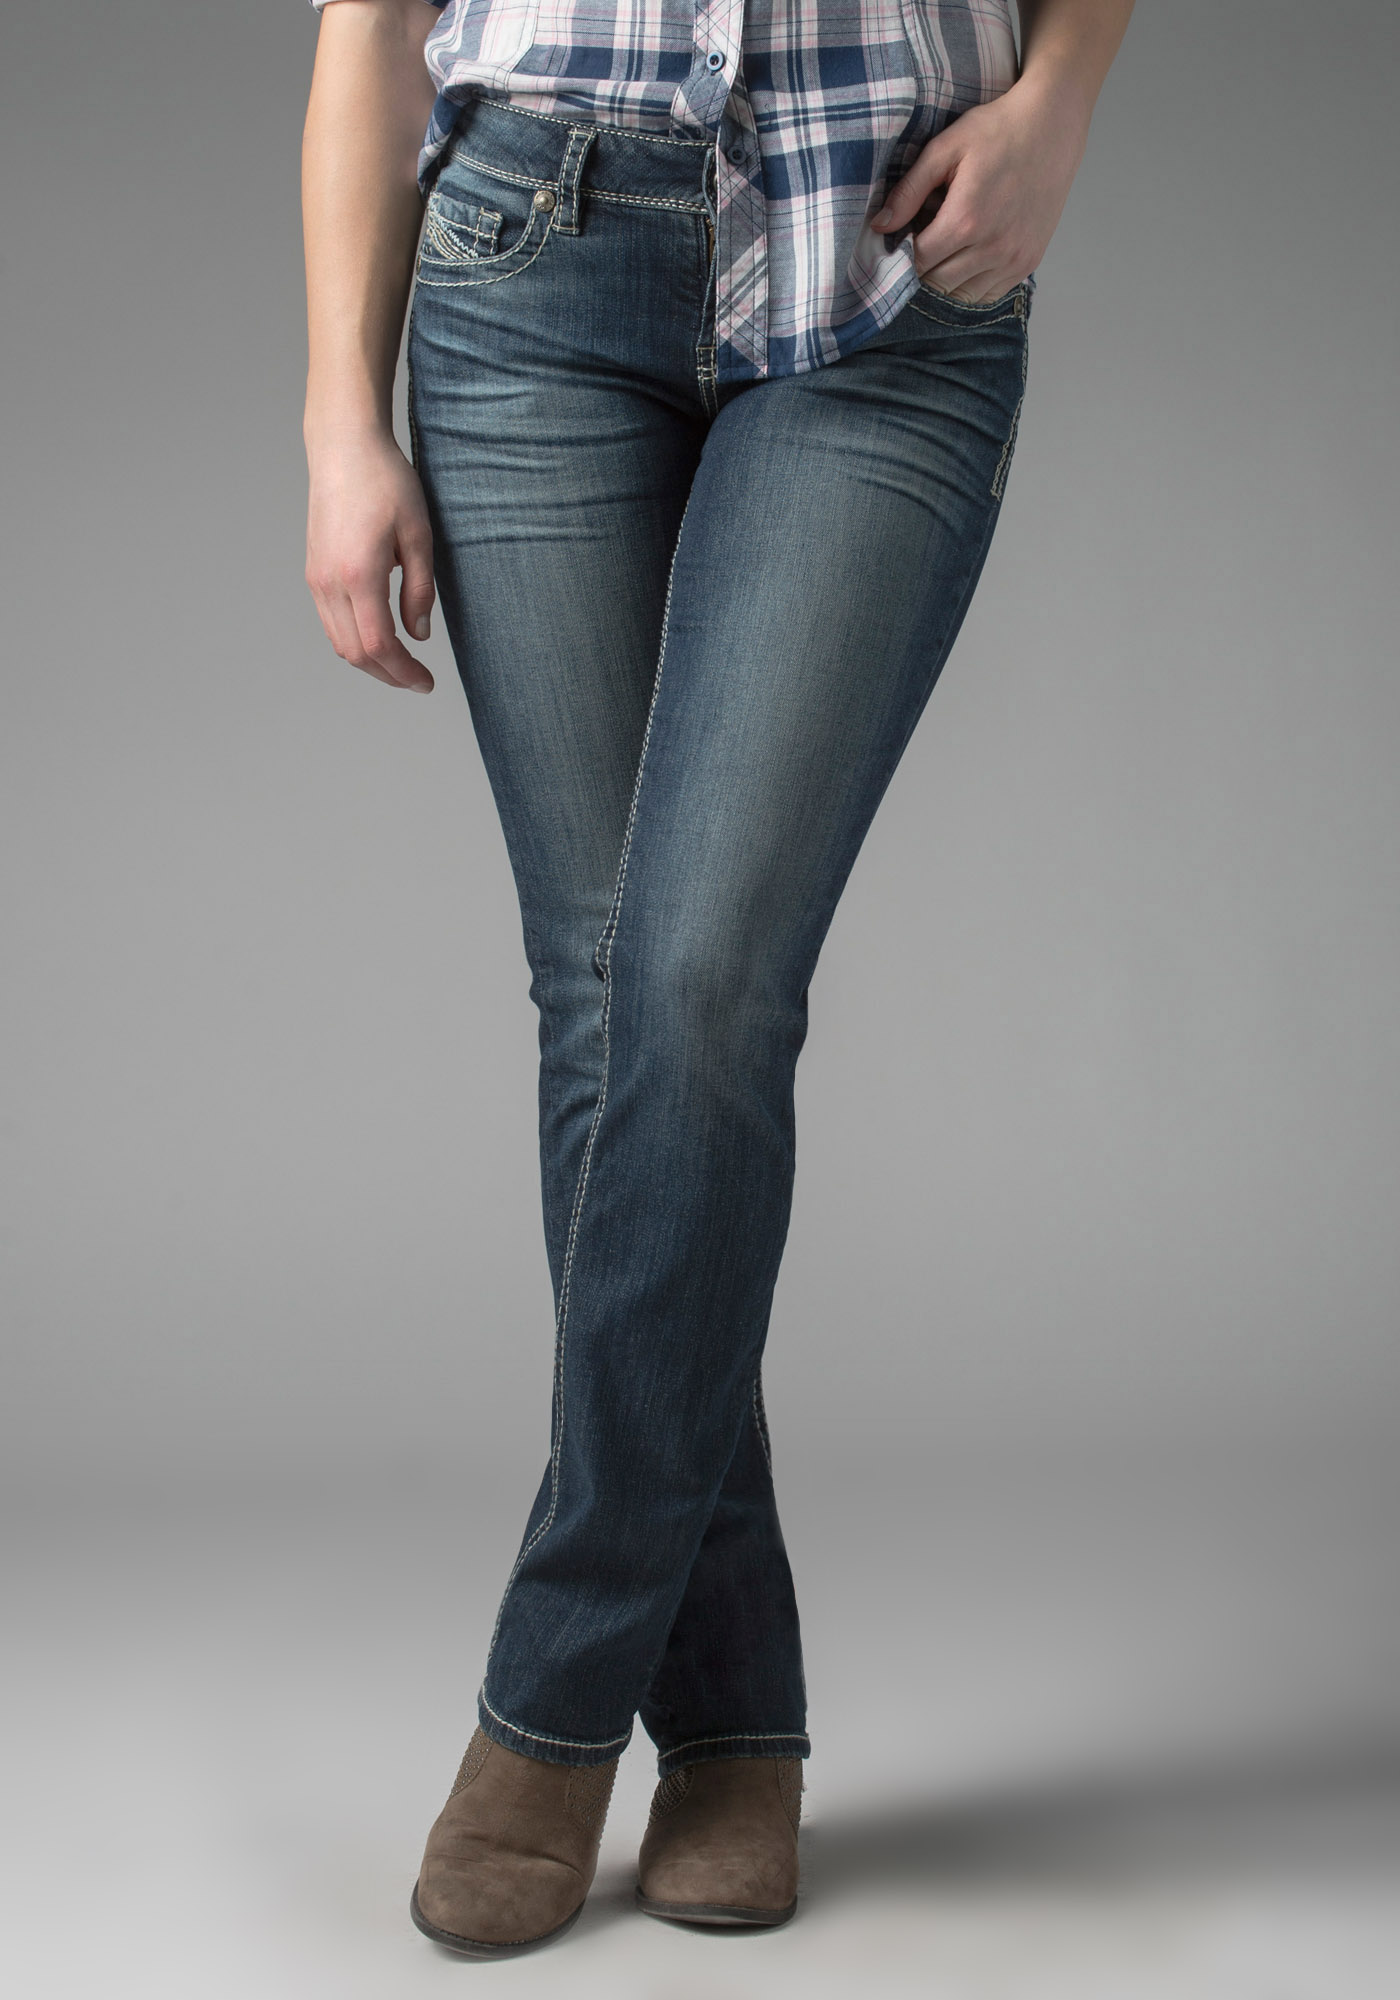 612eab8b Ladies Relaxed Straight Jeans, MEDIUM WASH, hi-res ...